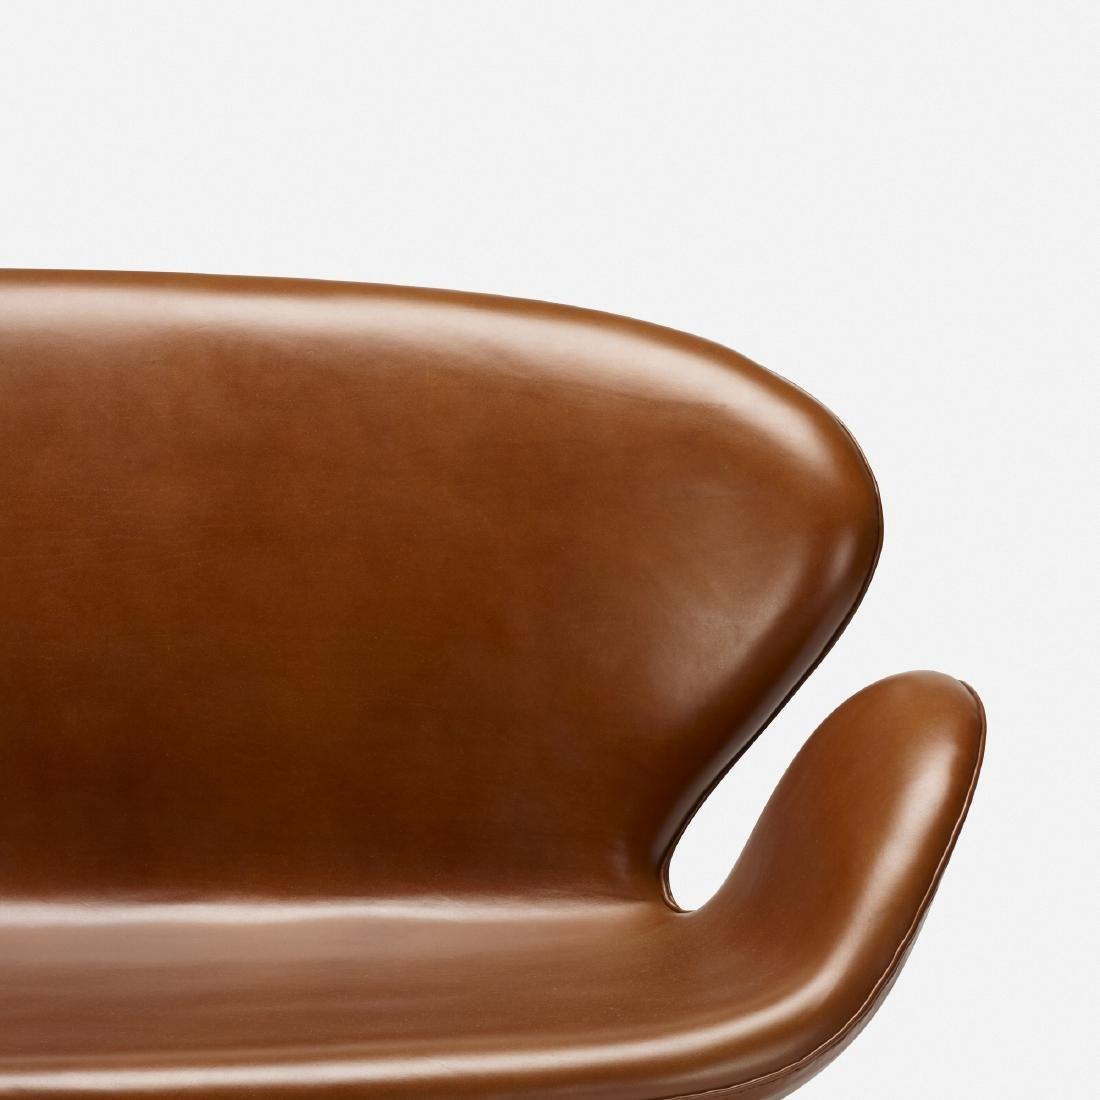 Arne Jacobsen, Swan settee, model 3321 - 3